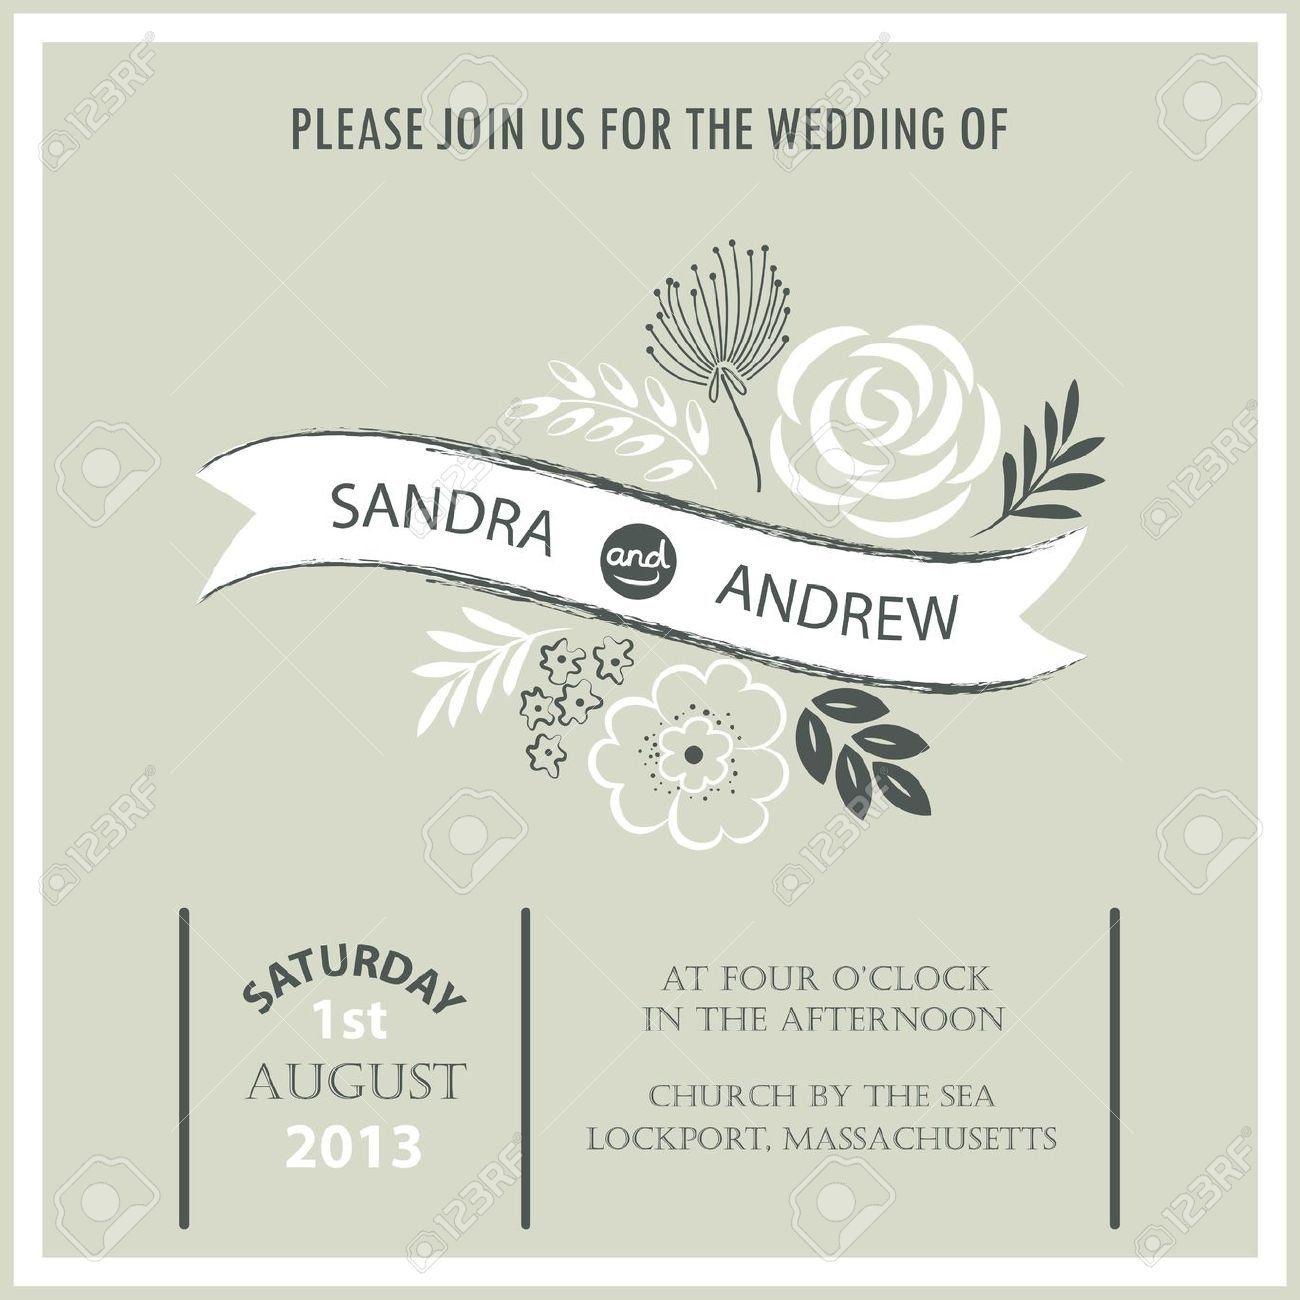 wedding-invitation-cards-online | wedding invitations | Pinterest ...